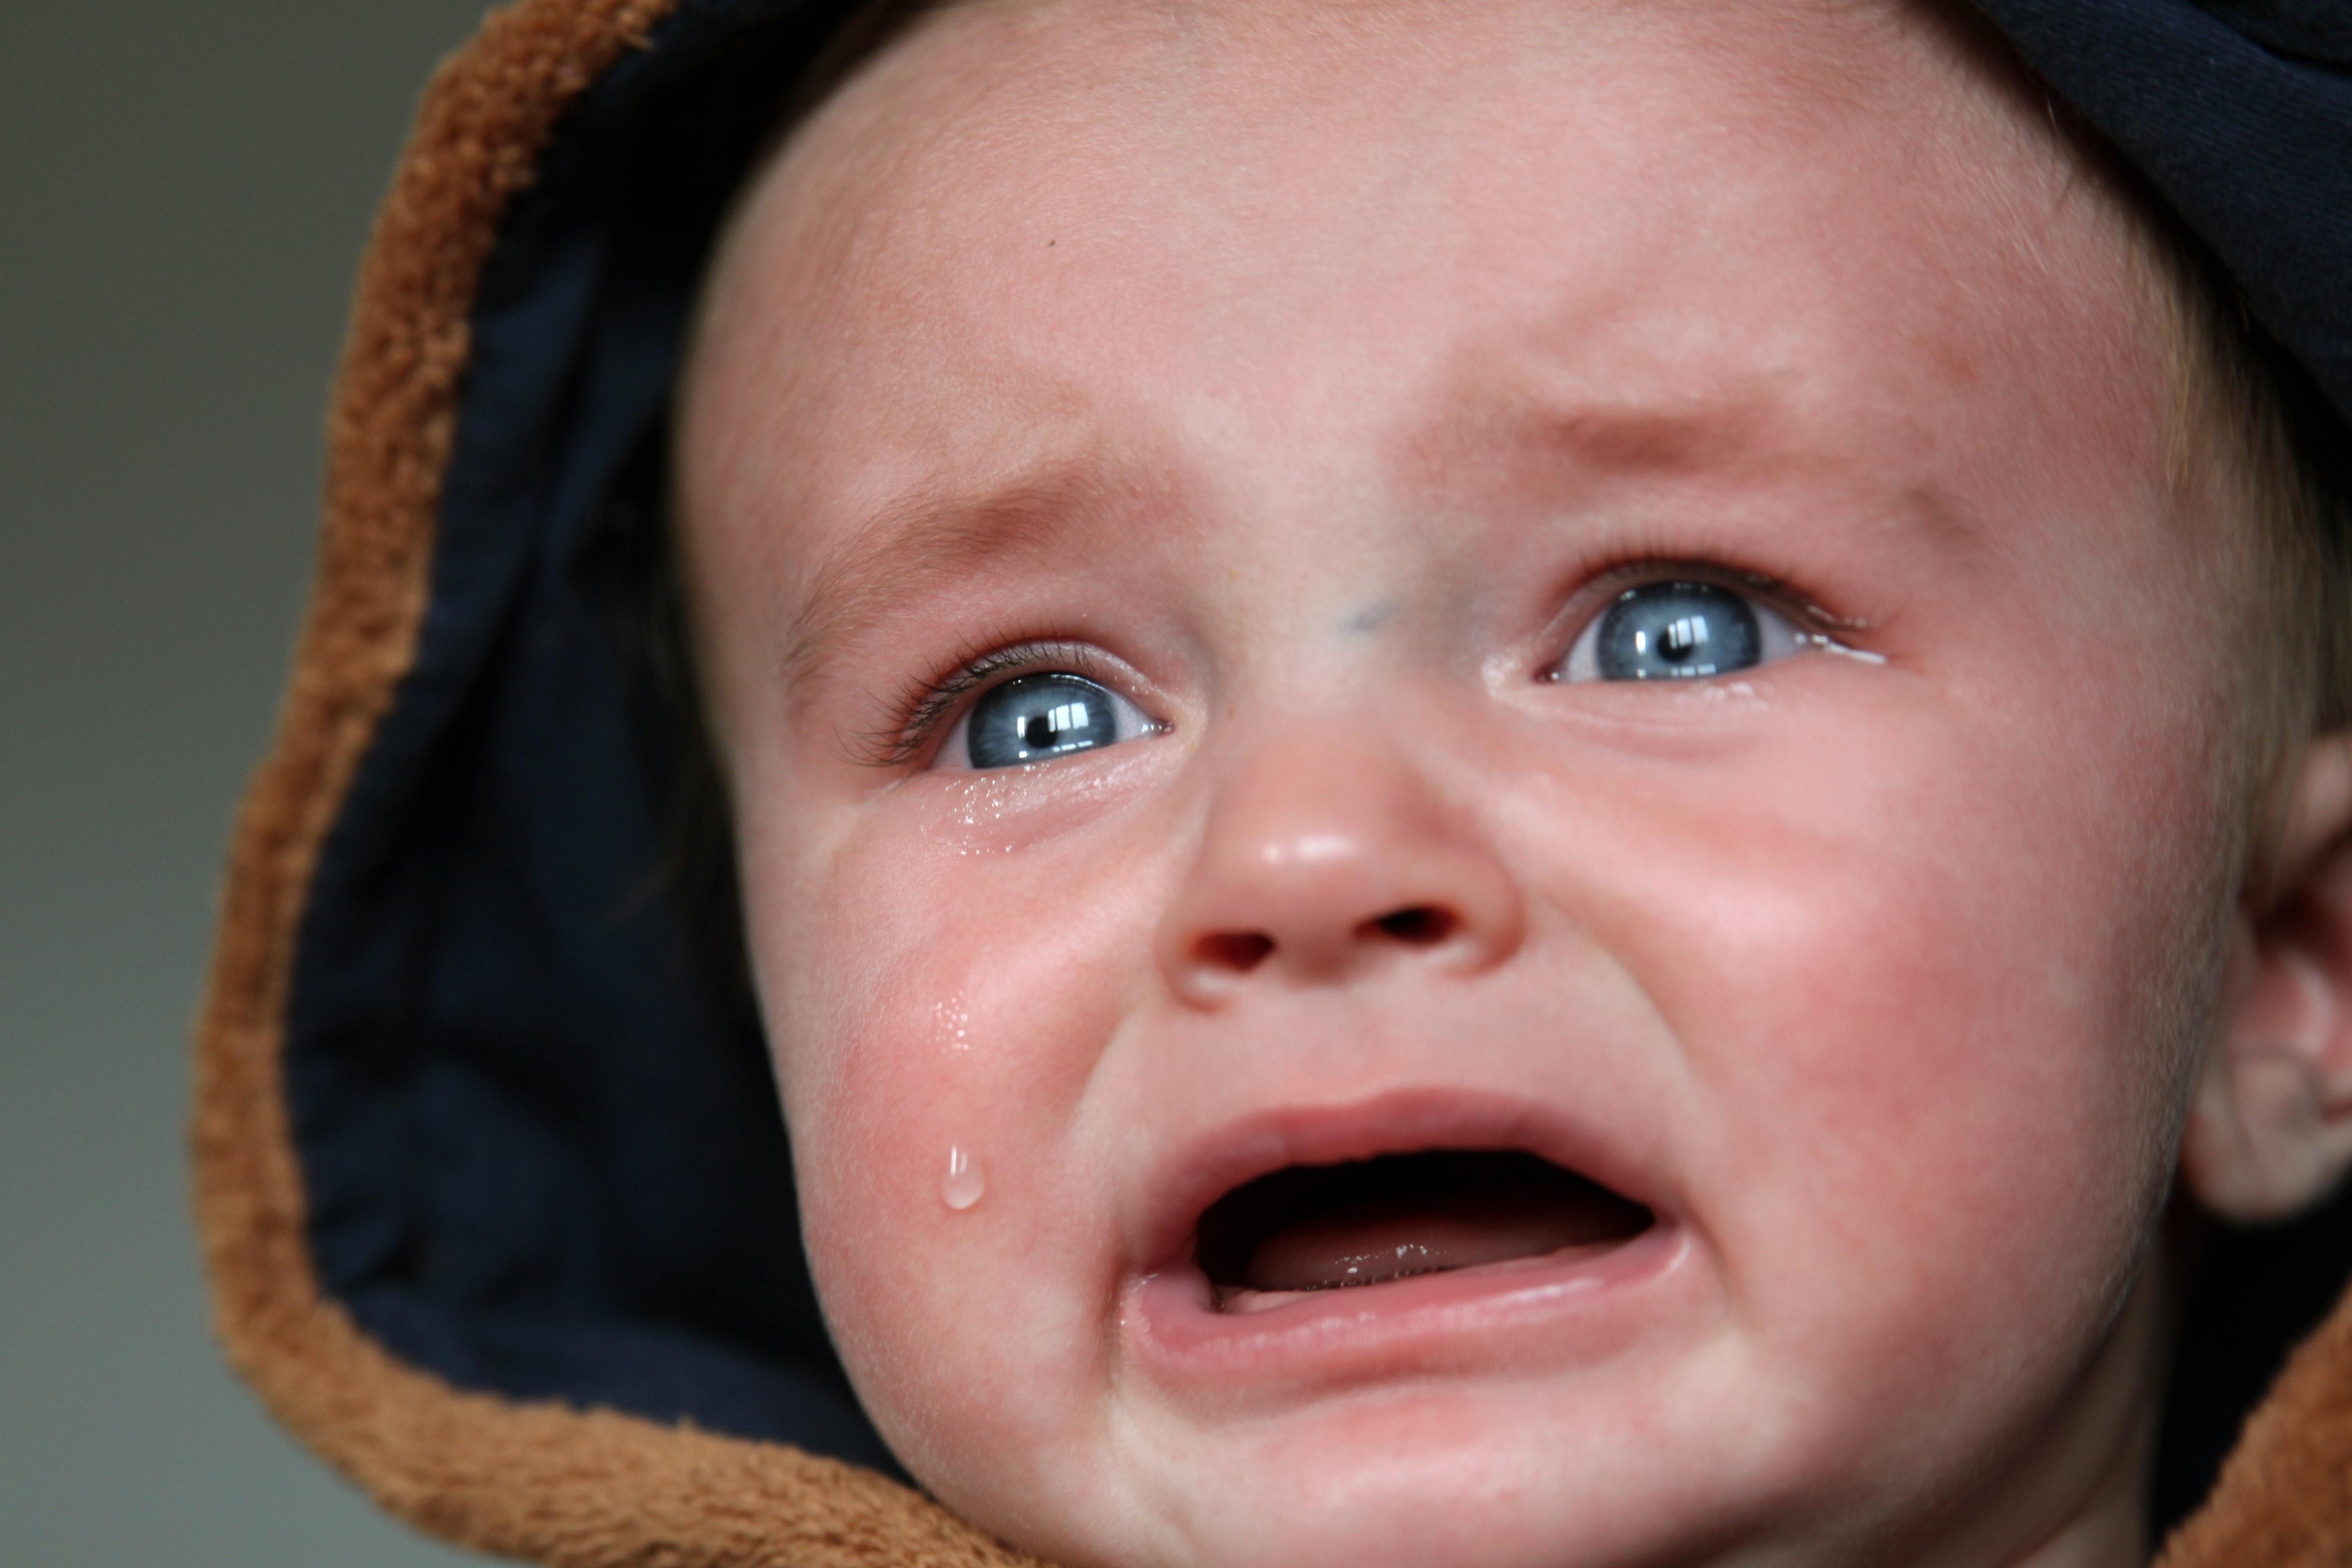 baby-child-close-up-47090.jpg